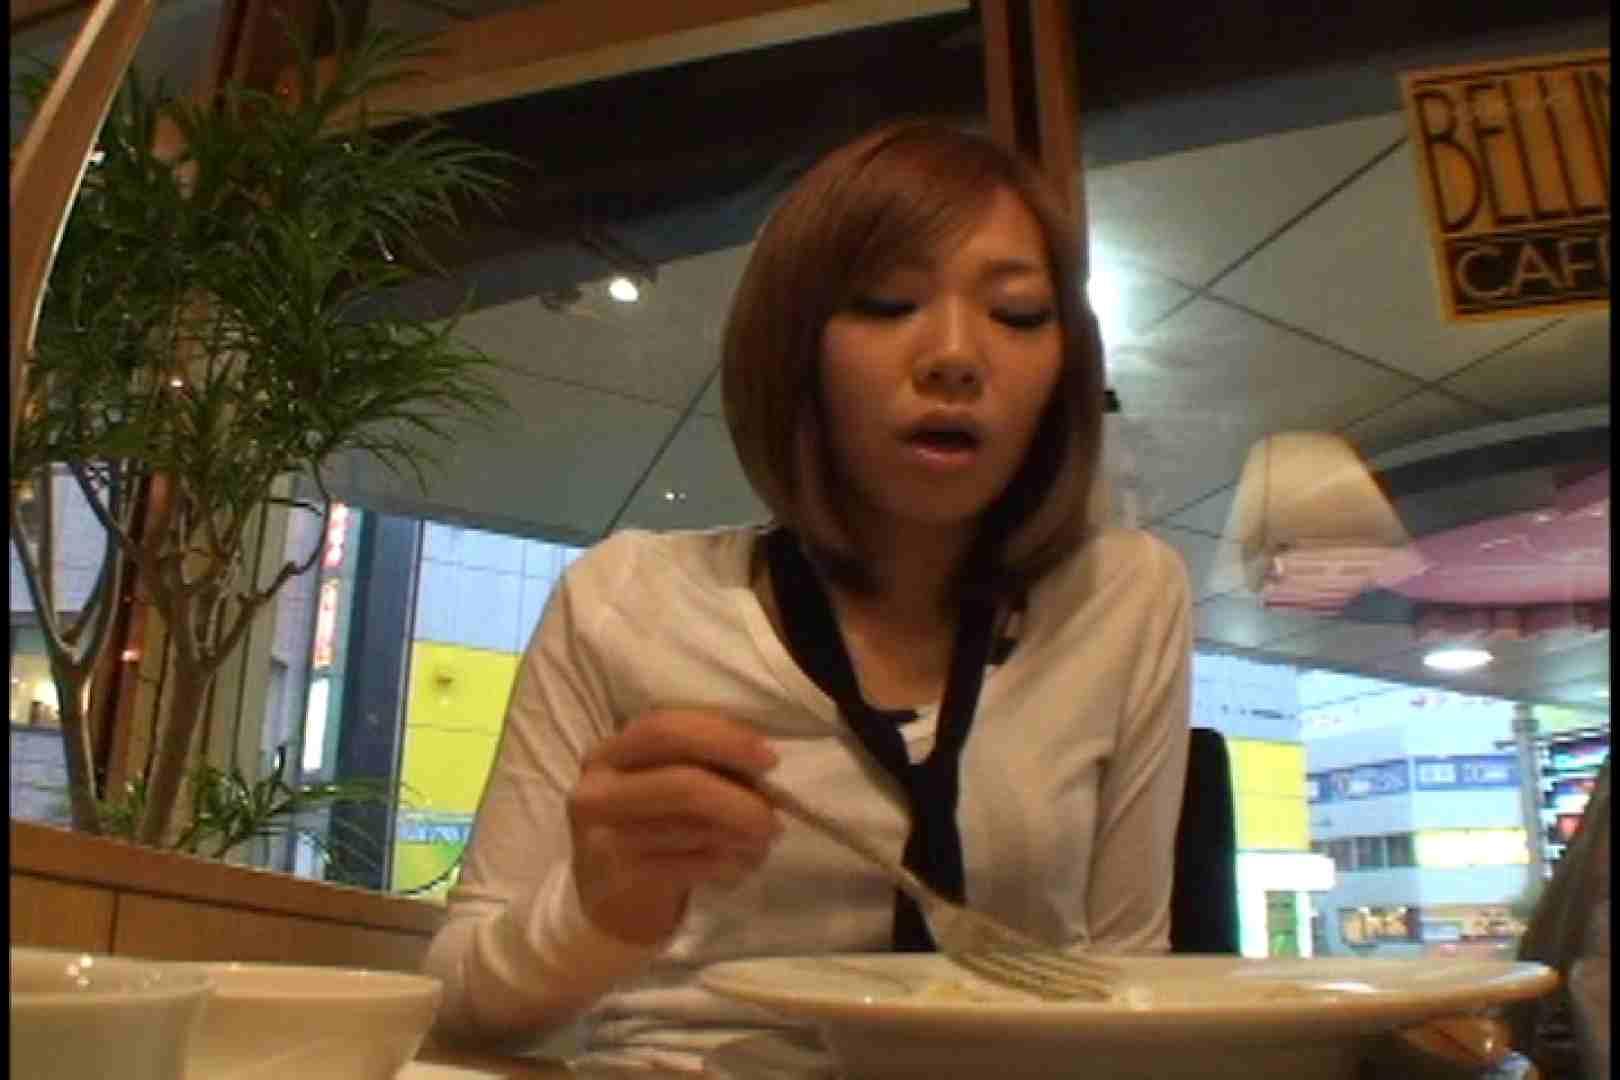 JDハンター全国ツアー vol.036 前編 女子大生のエロ動画 | 0  85PIX 27